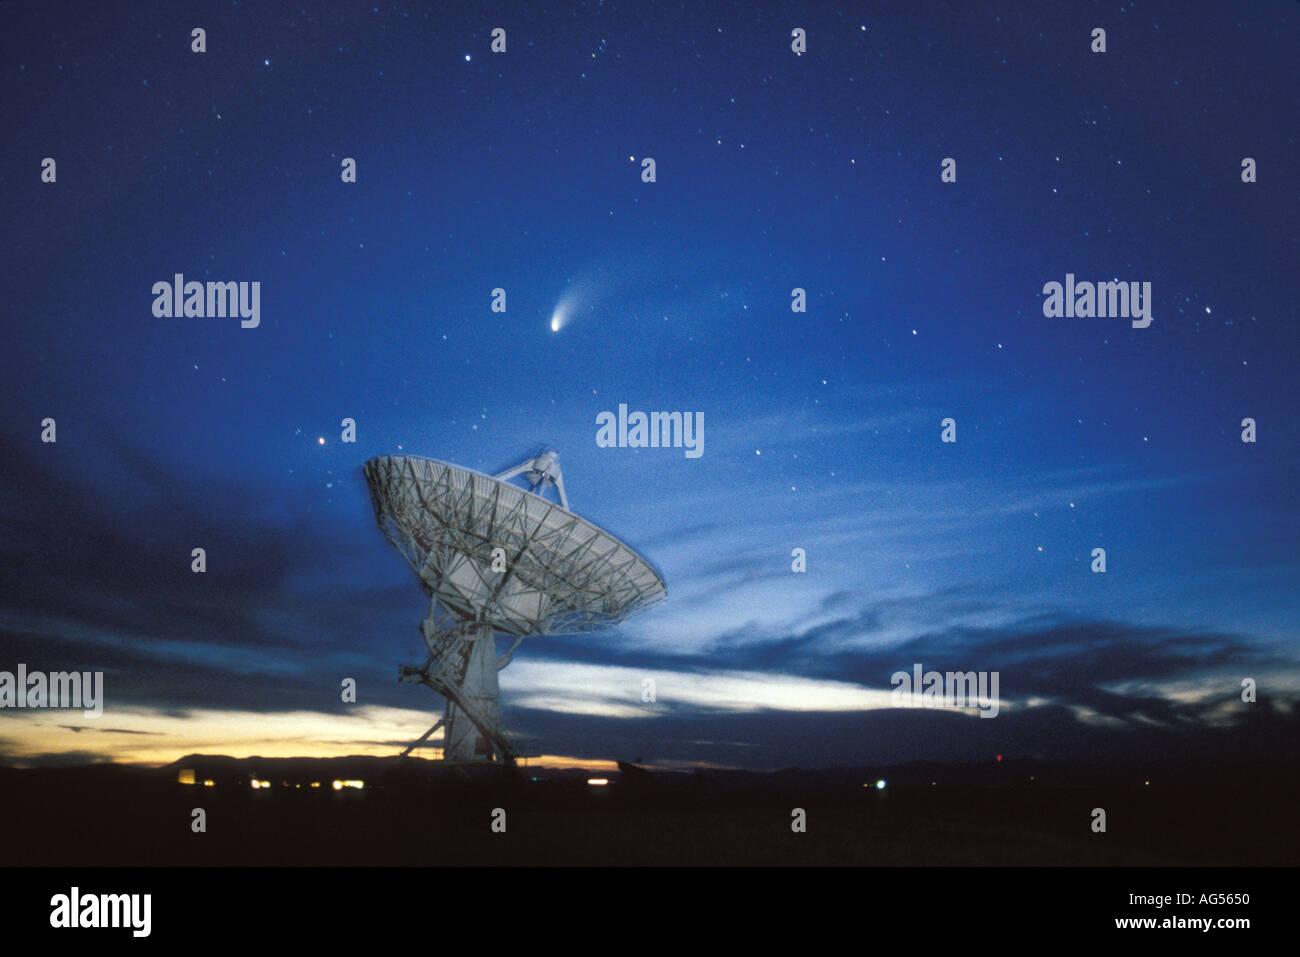 Comet Hale Bopp and VLA Radio telescope - Stock Image